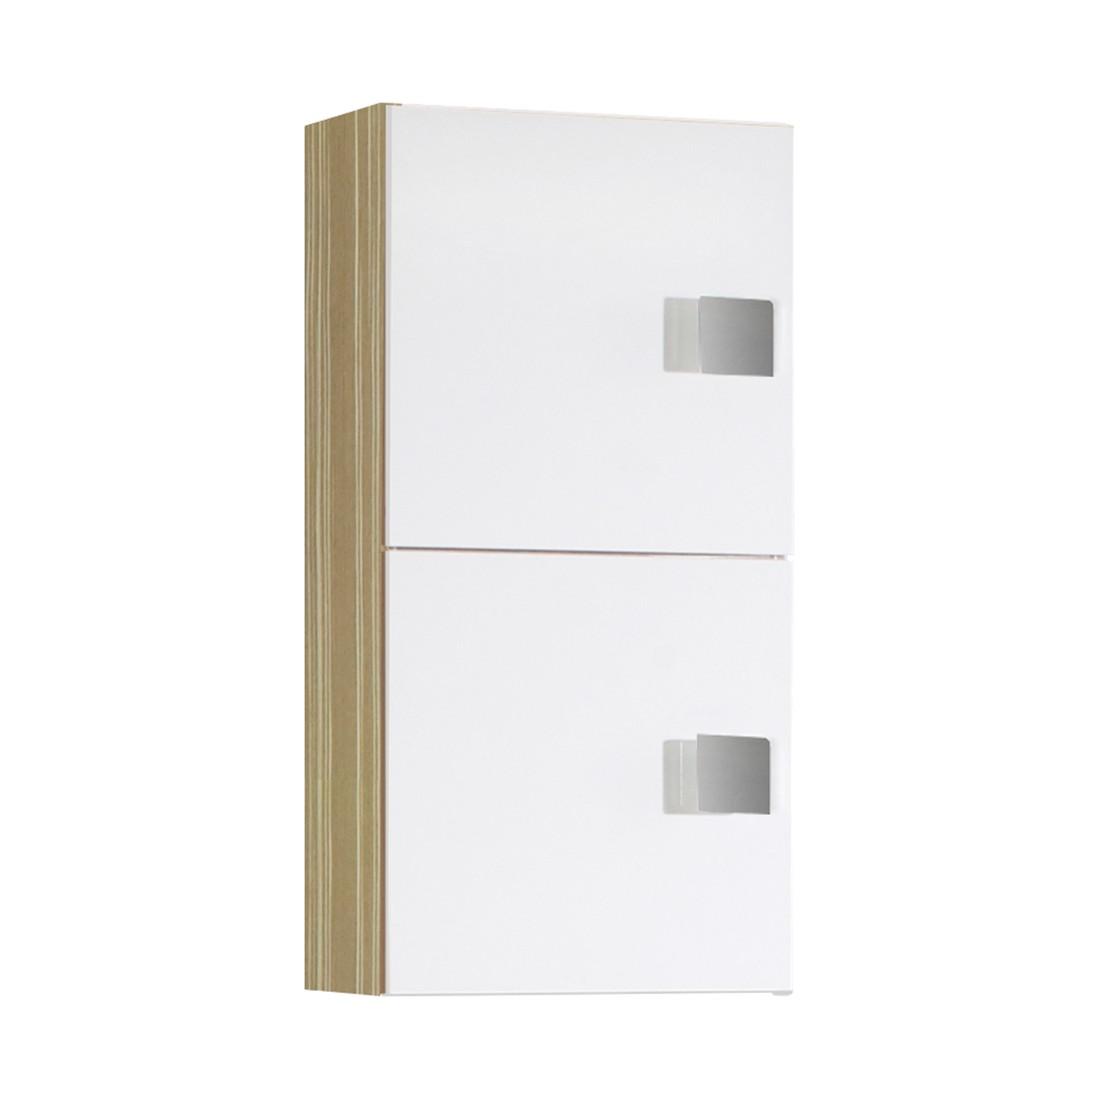 h ngeschrank genf wei glanz zebrino beige 4 t rig. Black Bedroom Furniture Sets. Home Design Ideas